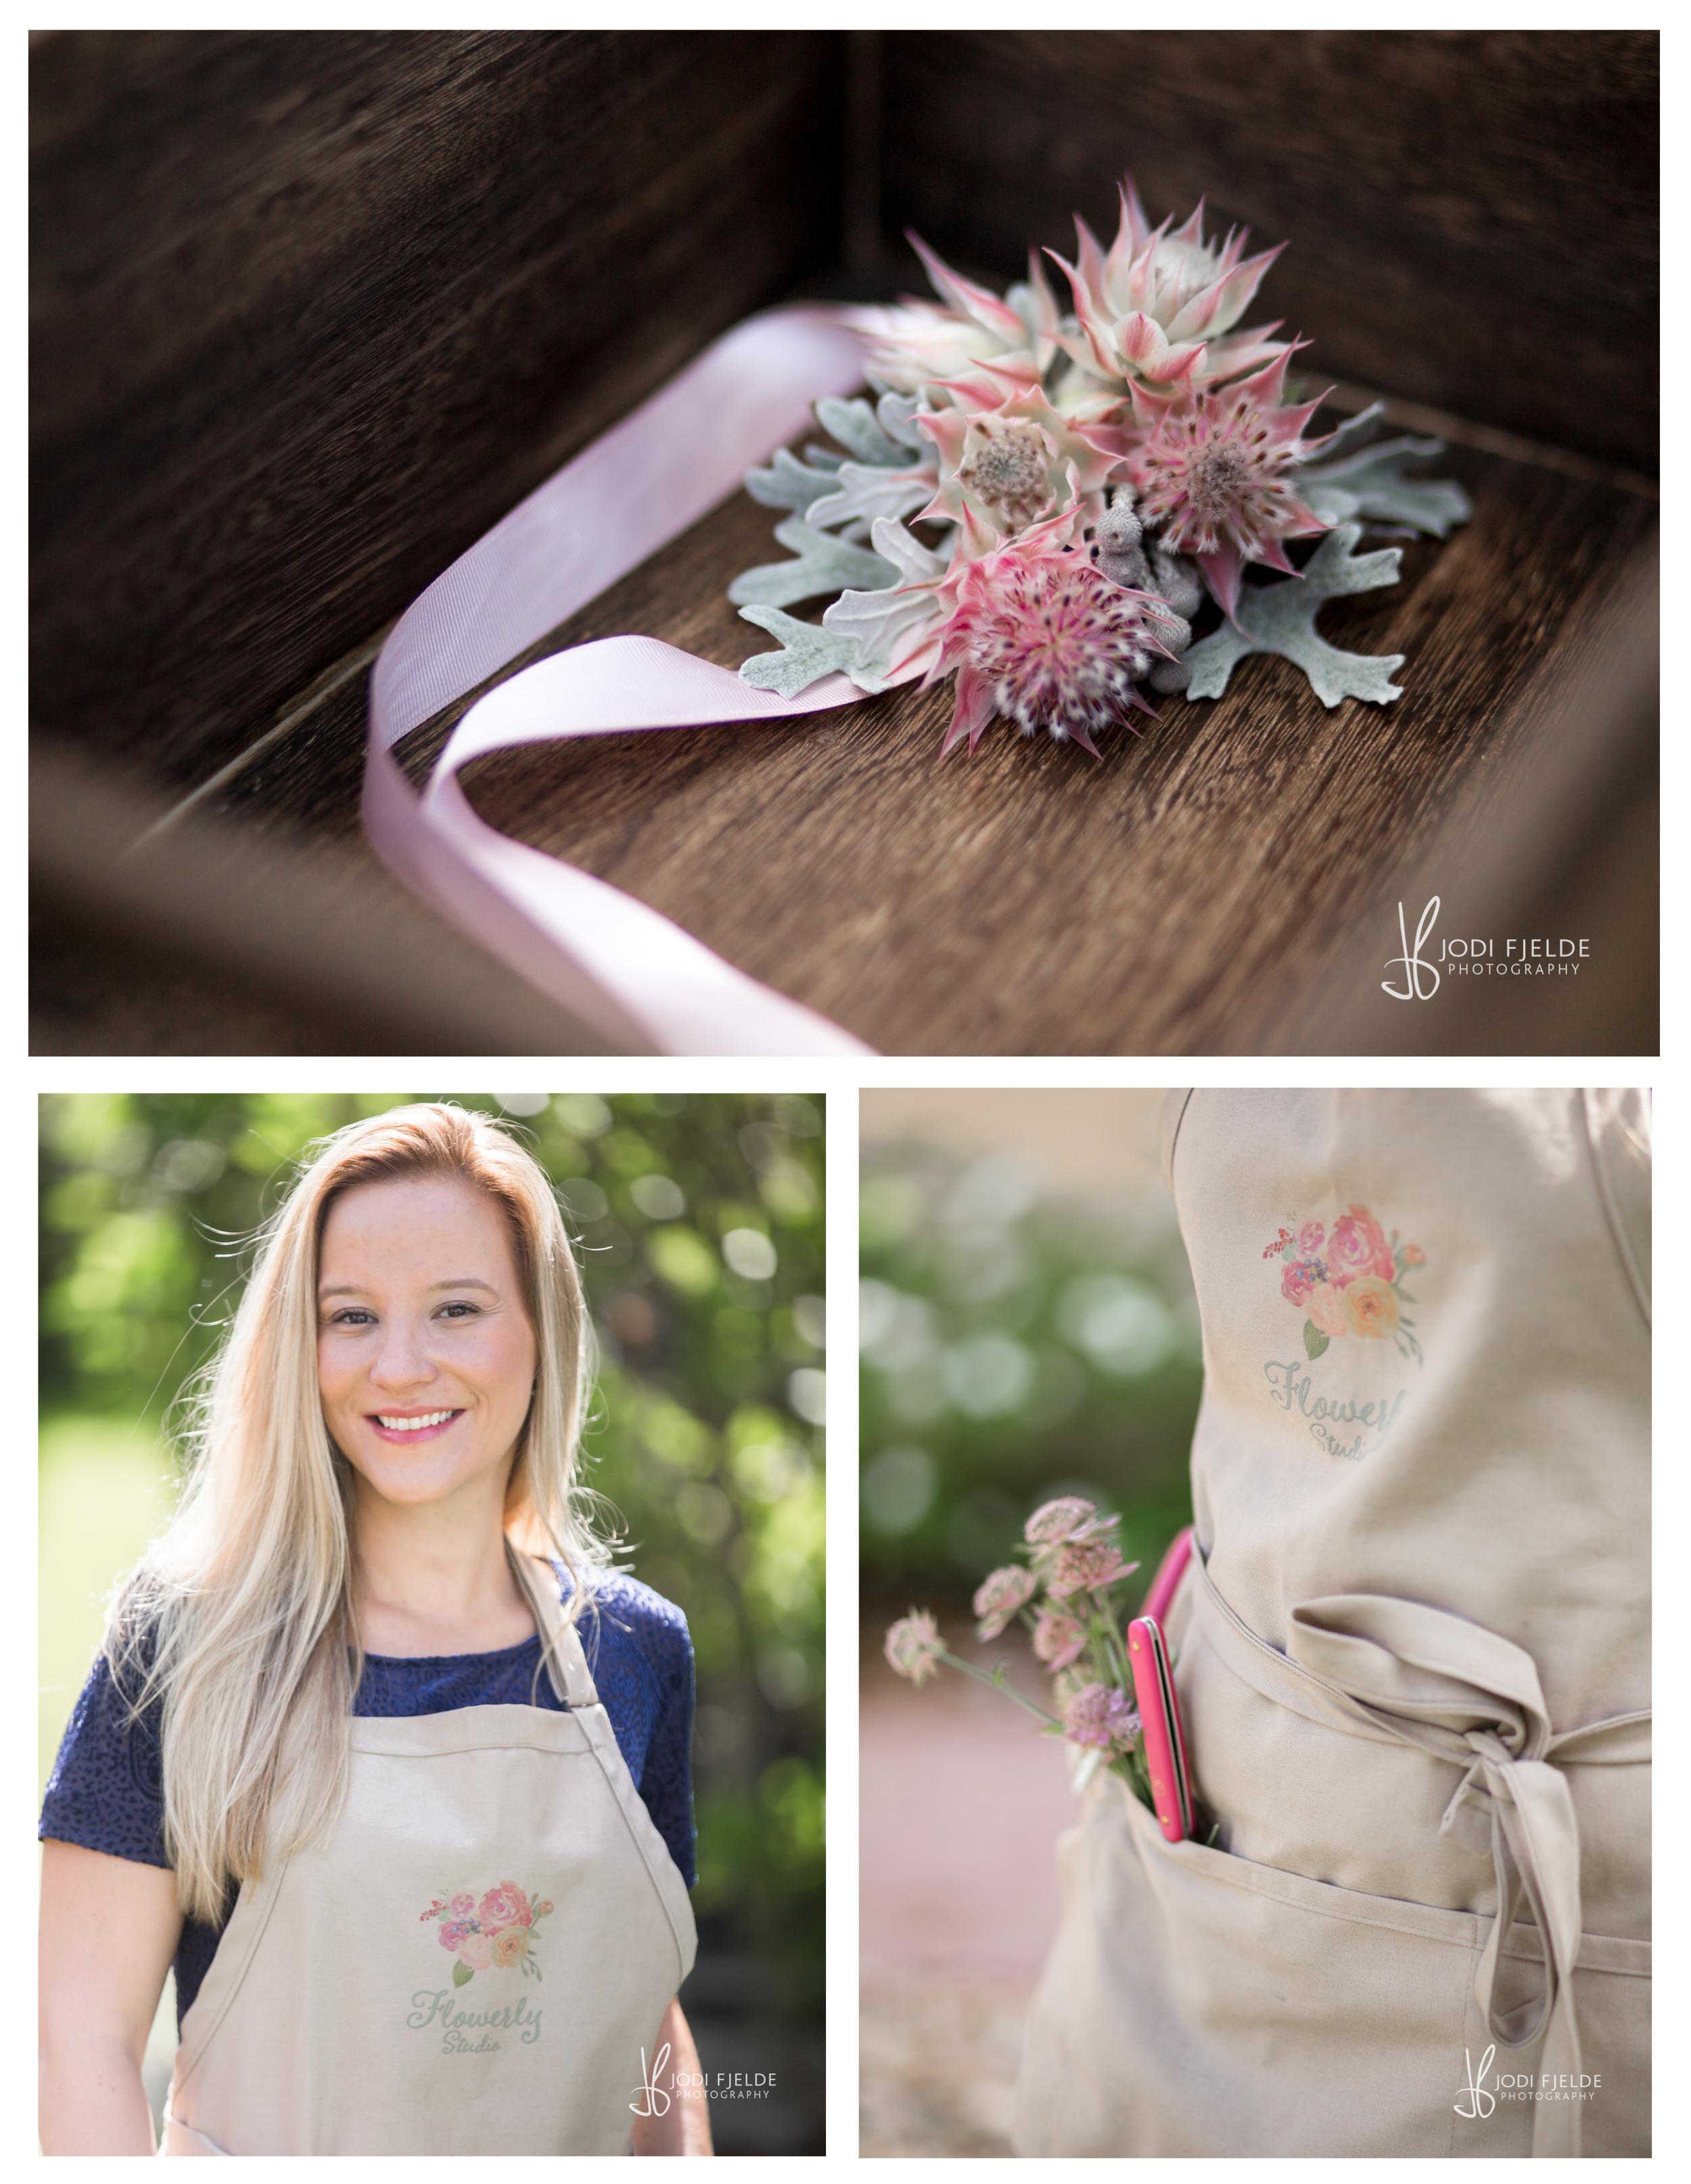 Parkland_Commercial_Business_Branding_Photography_Flowerly Studio_Jodi_Fjelde_Photogrpahy_6.jpg